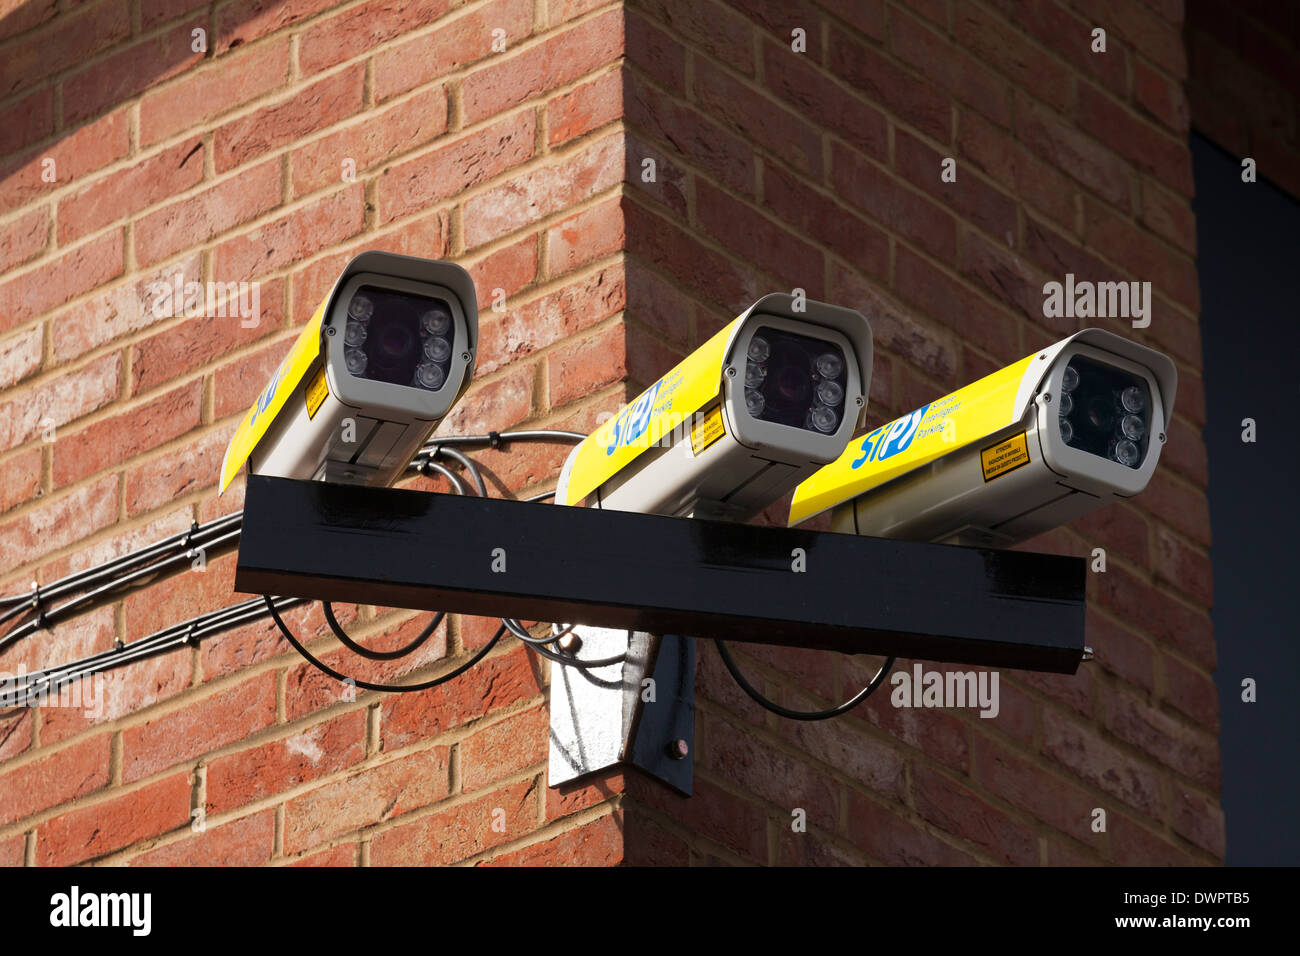 Drei Parkplätze Überwachung Video-Kameras. Stockbild